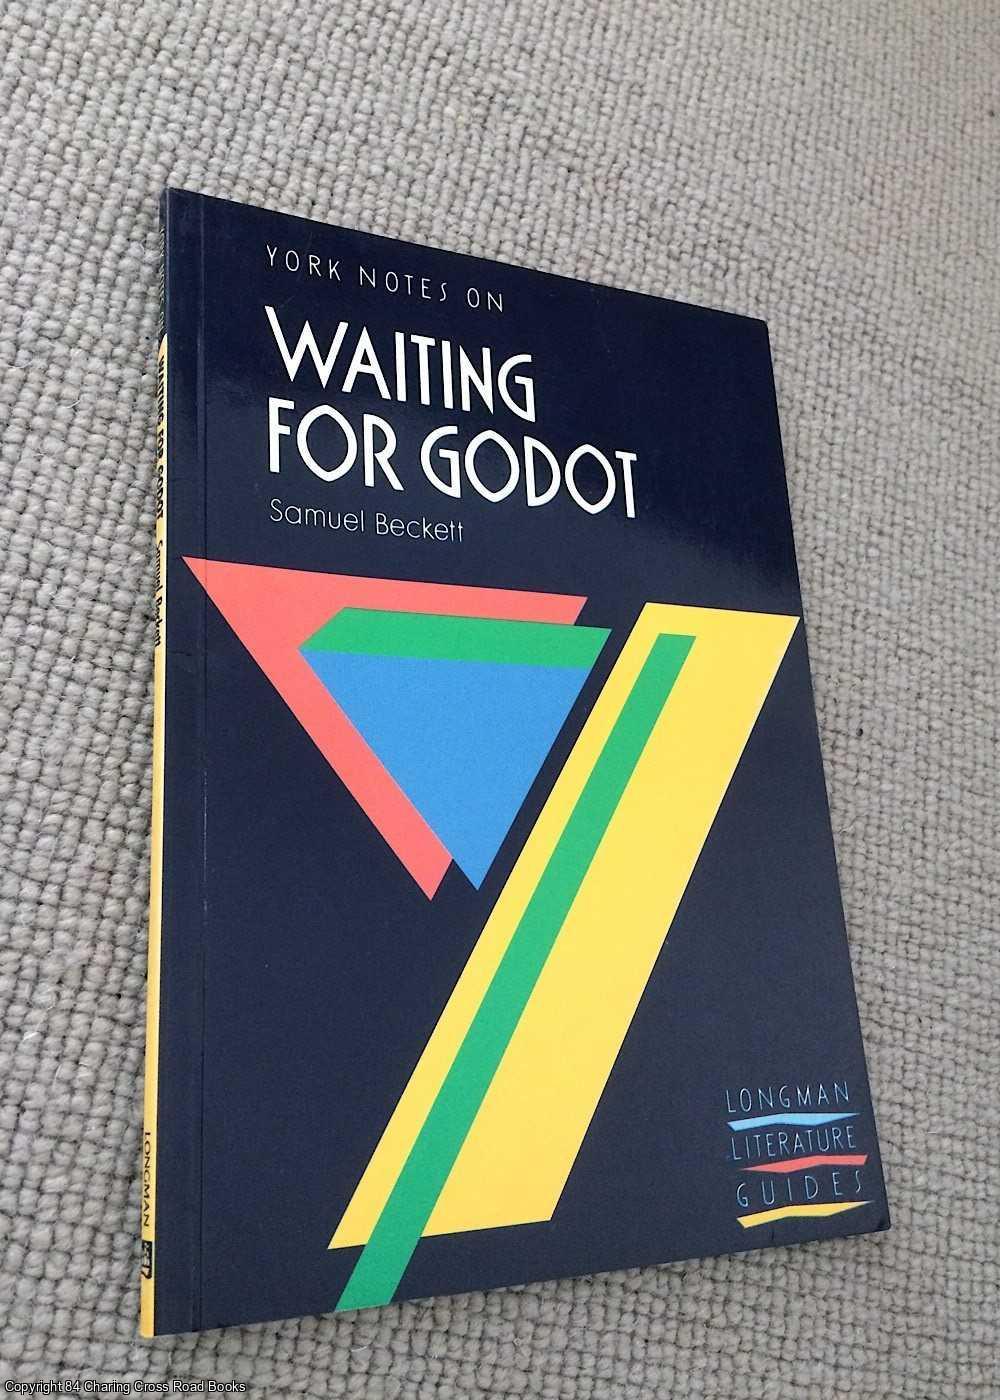 BECKETT, SAMUEL; POUNTNEY; ZURBRUGG - Waiting for Godot